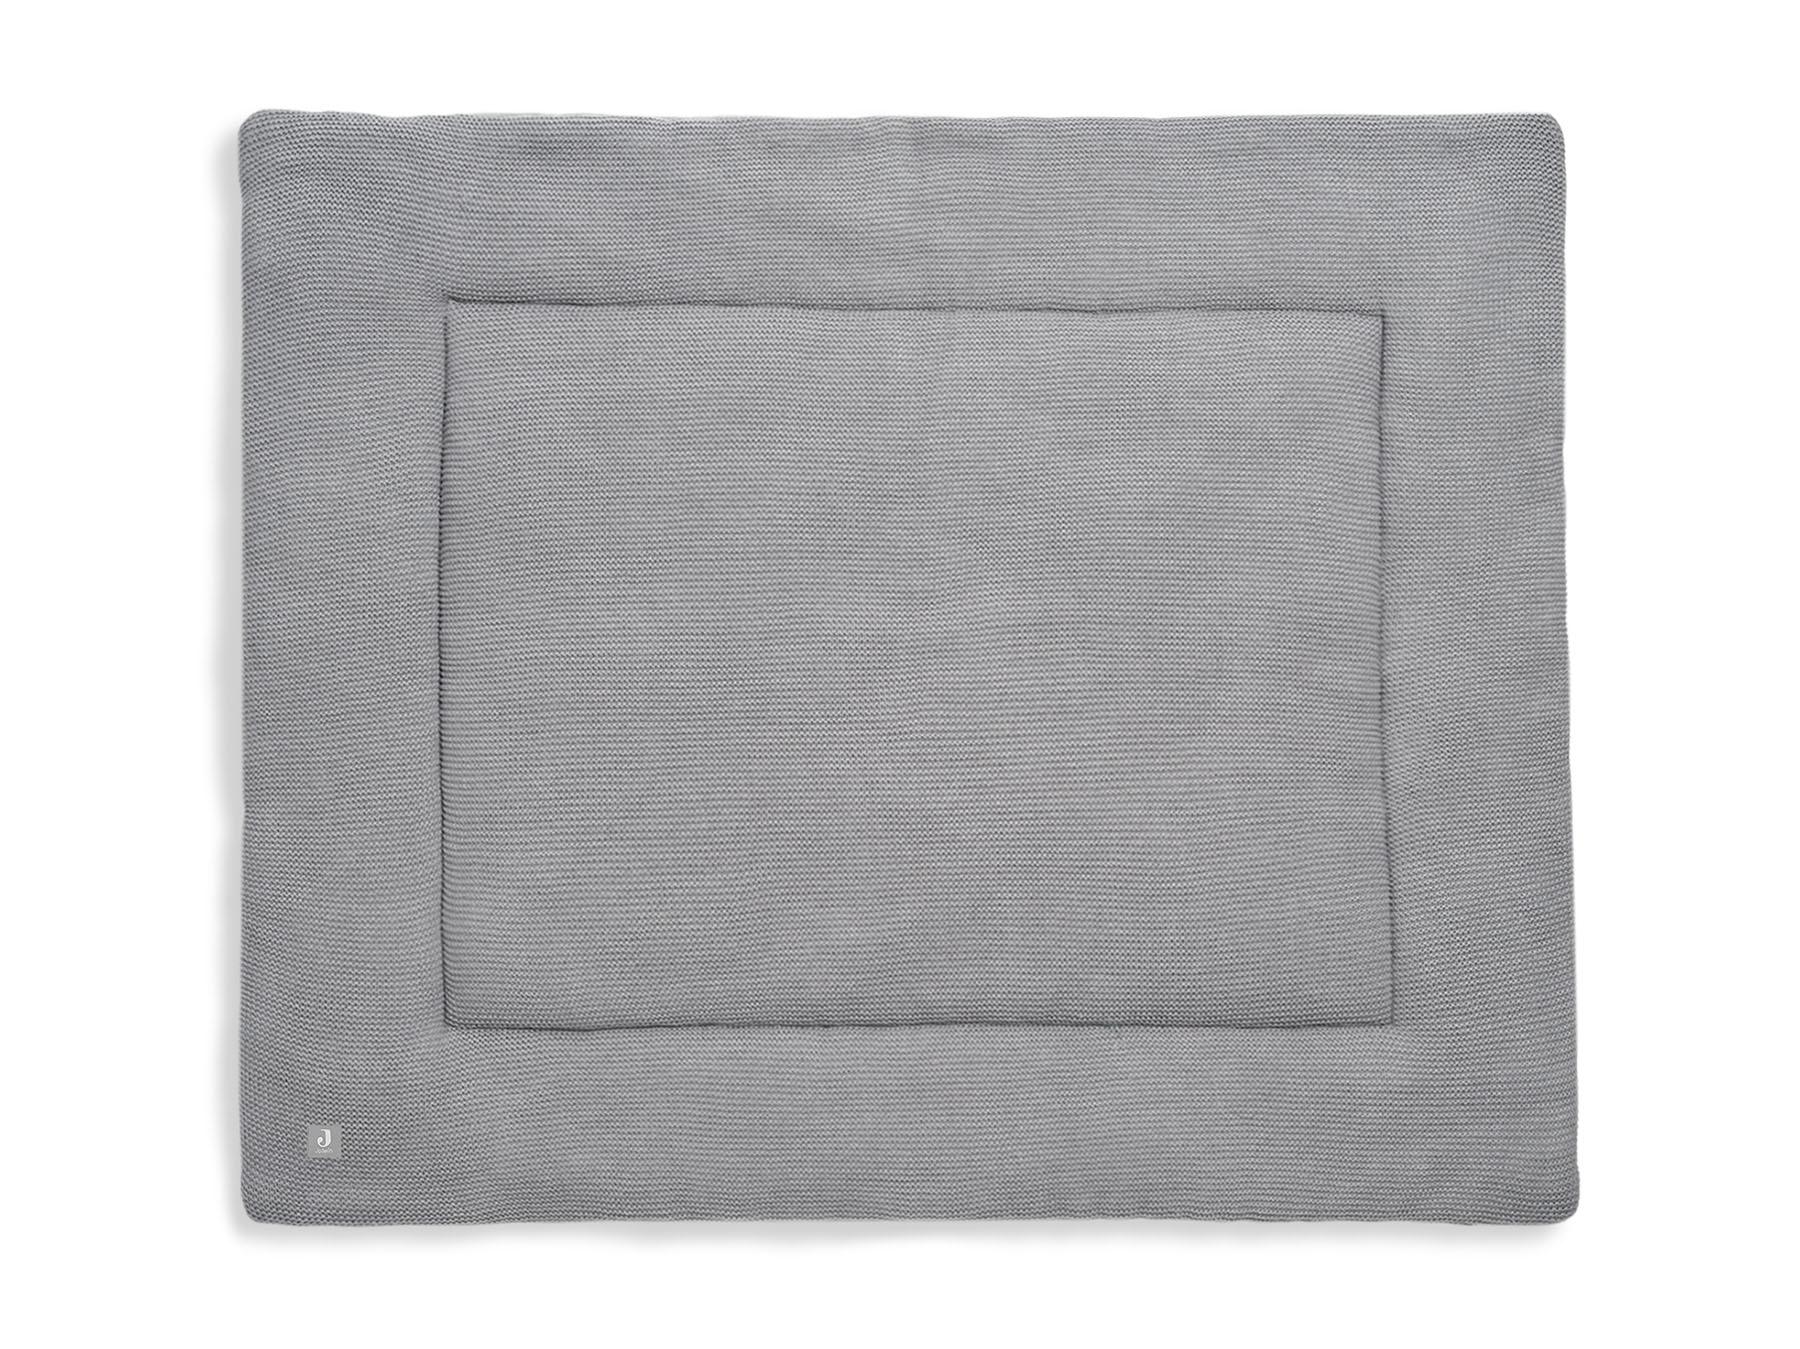 Laufgittereinlage Krabbeldecke Strick Basic Knit grau (80x100 cm)